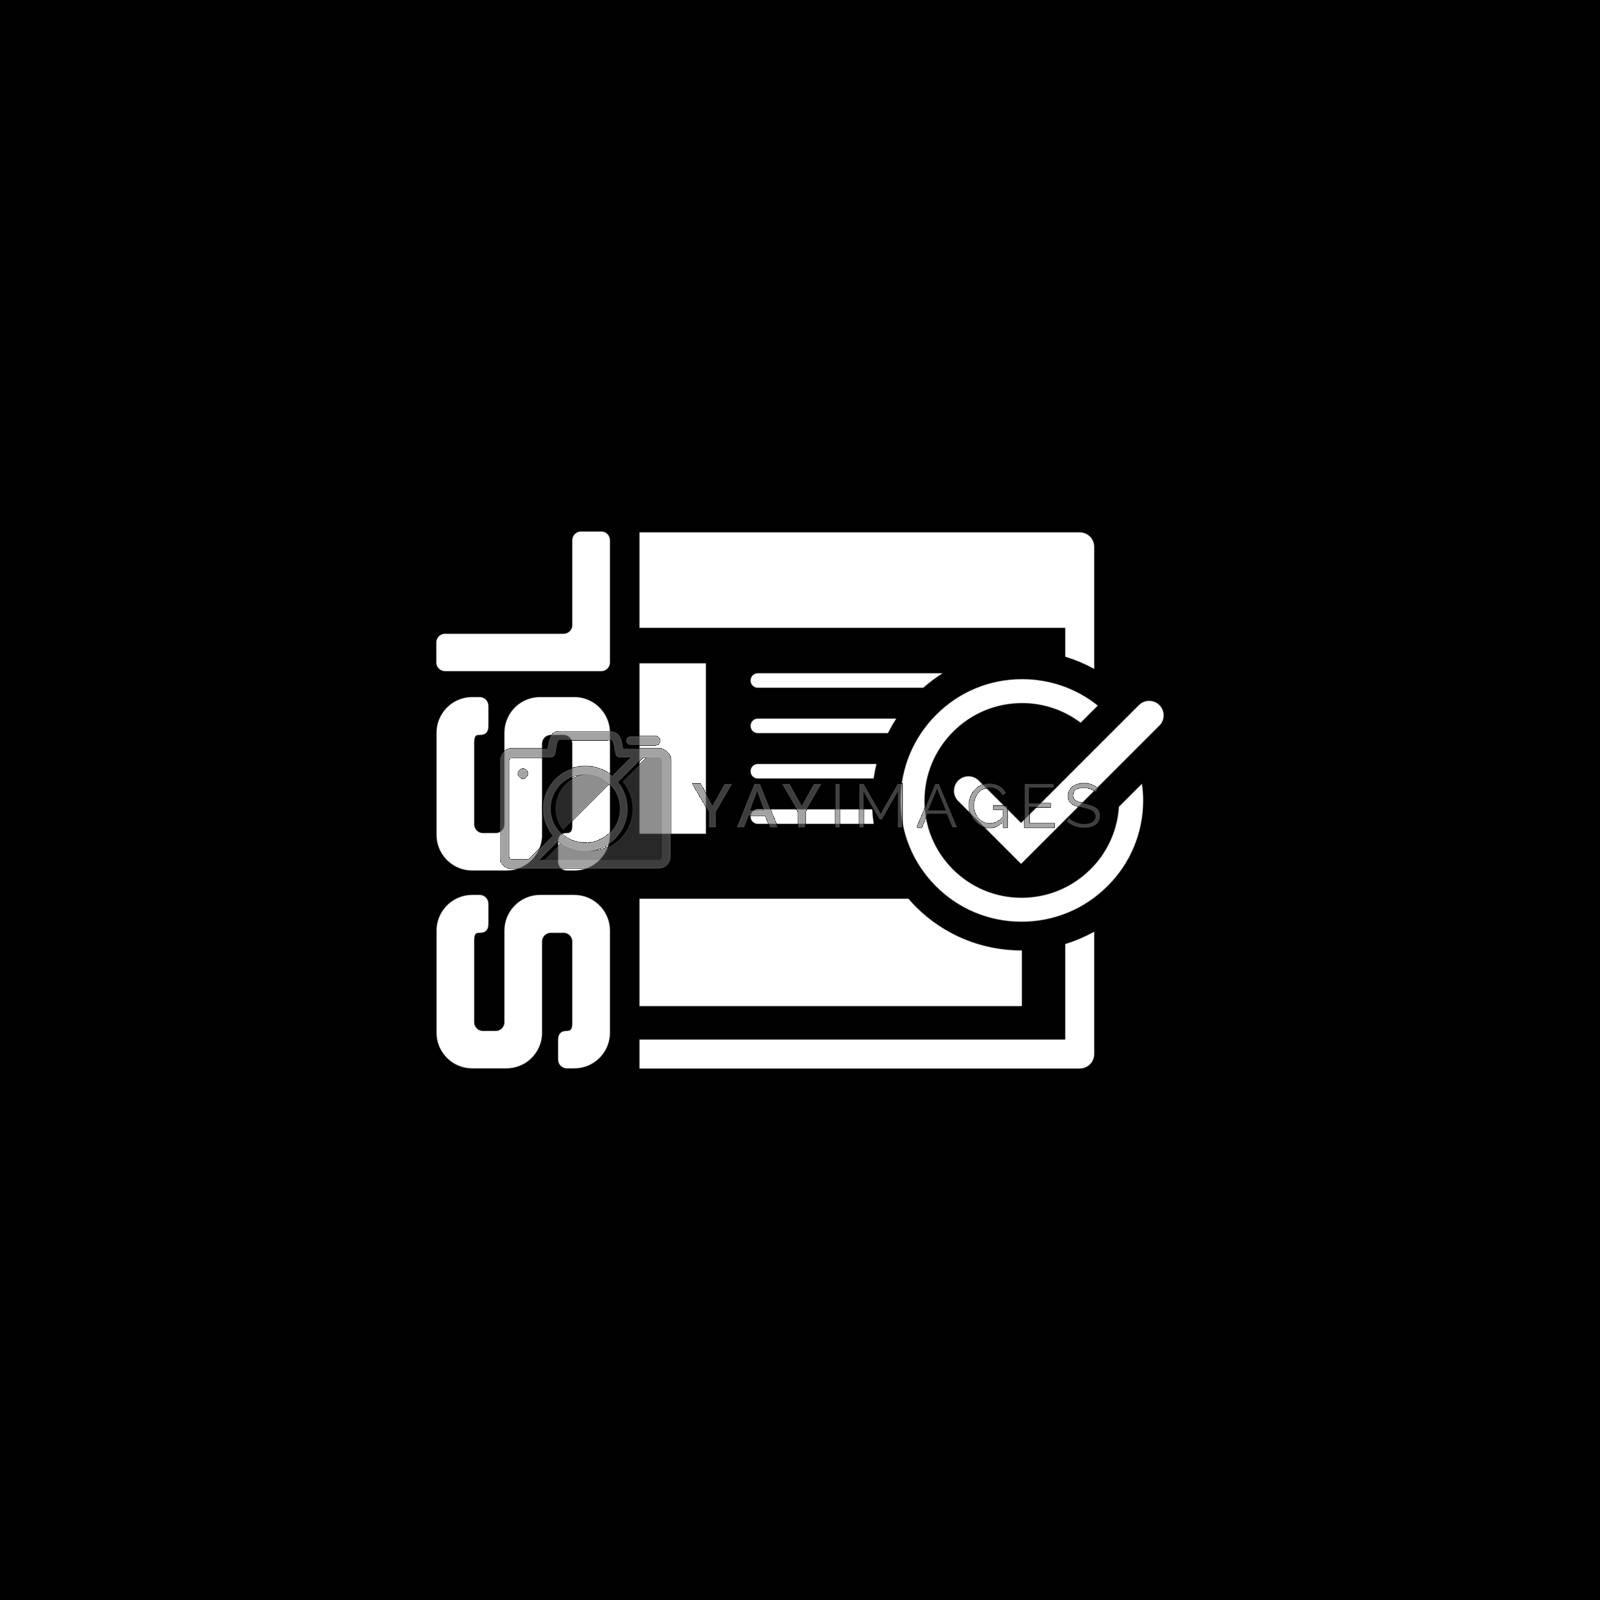 SSL Secured Icon. Flat Design Isolated Illustration.